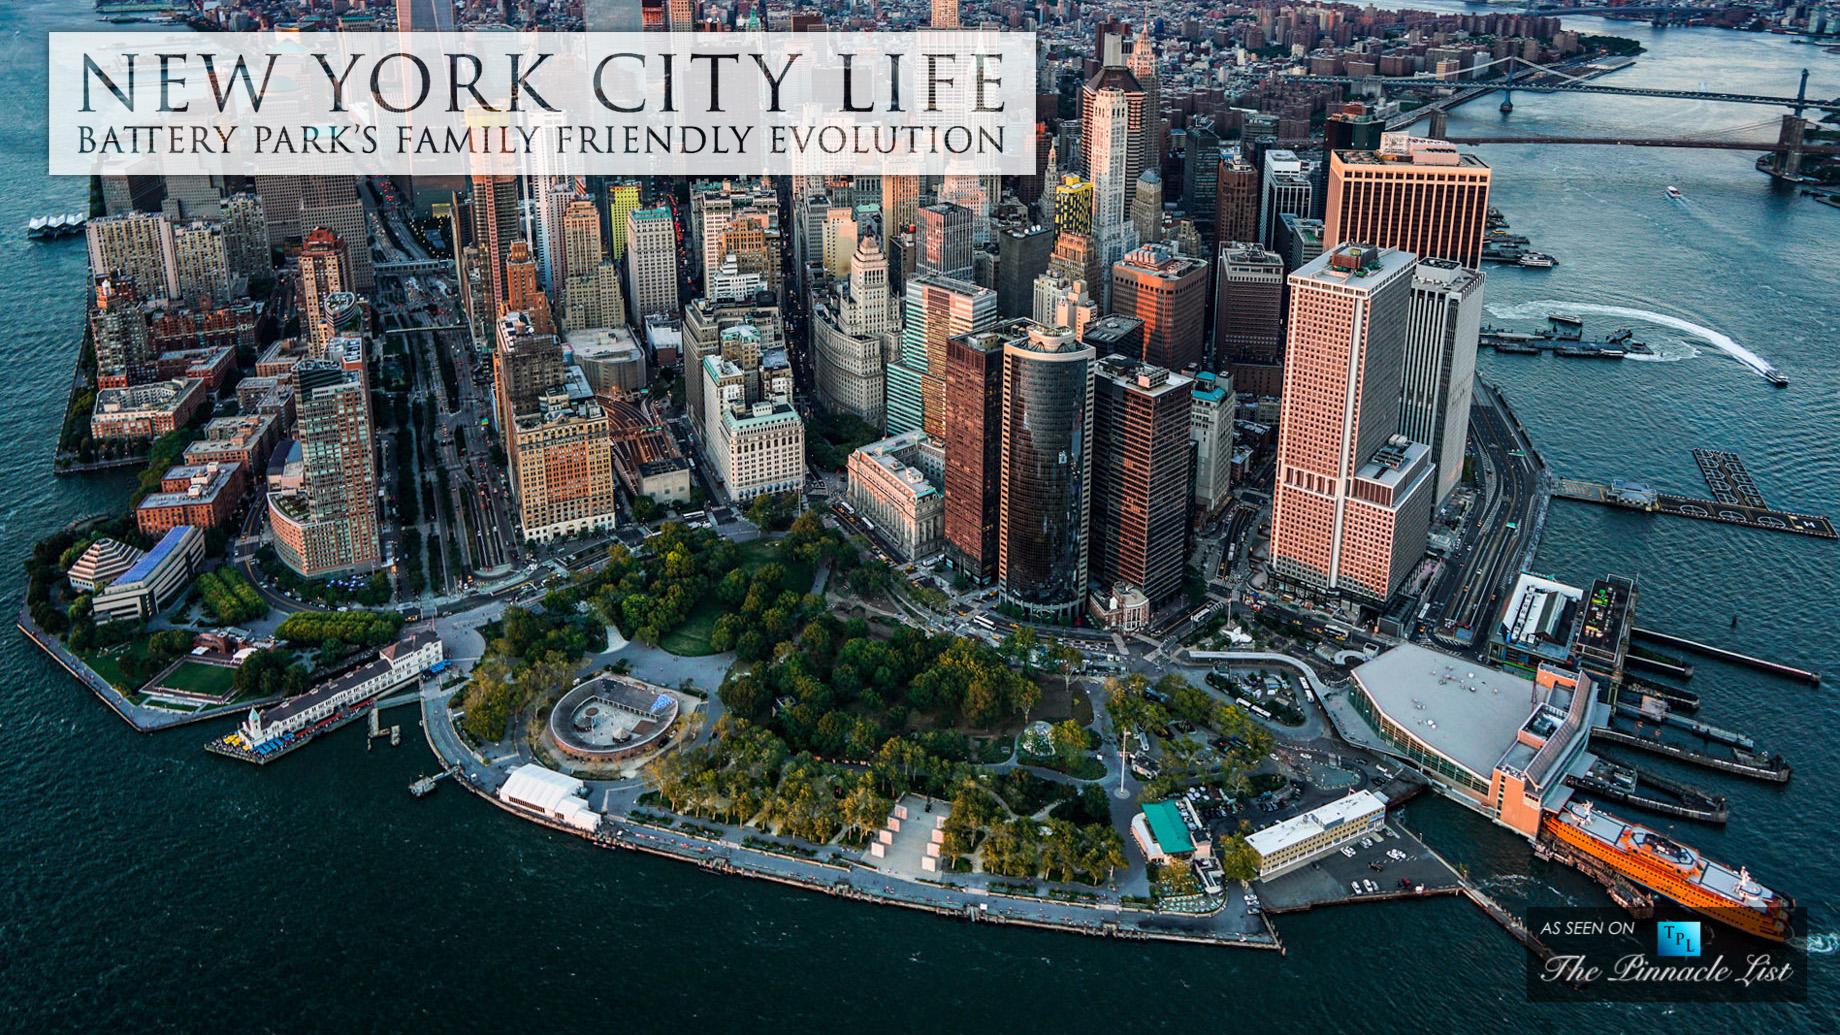 New York City Life - Battery Park's Family Friendly Evolution